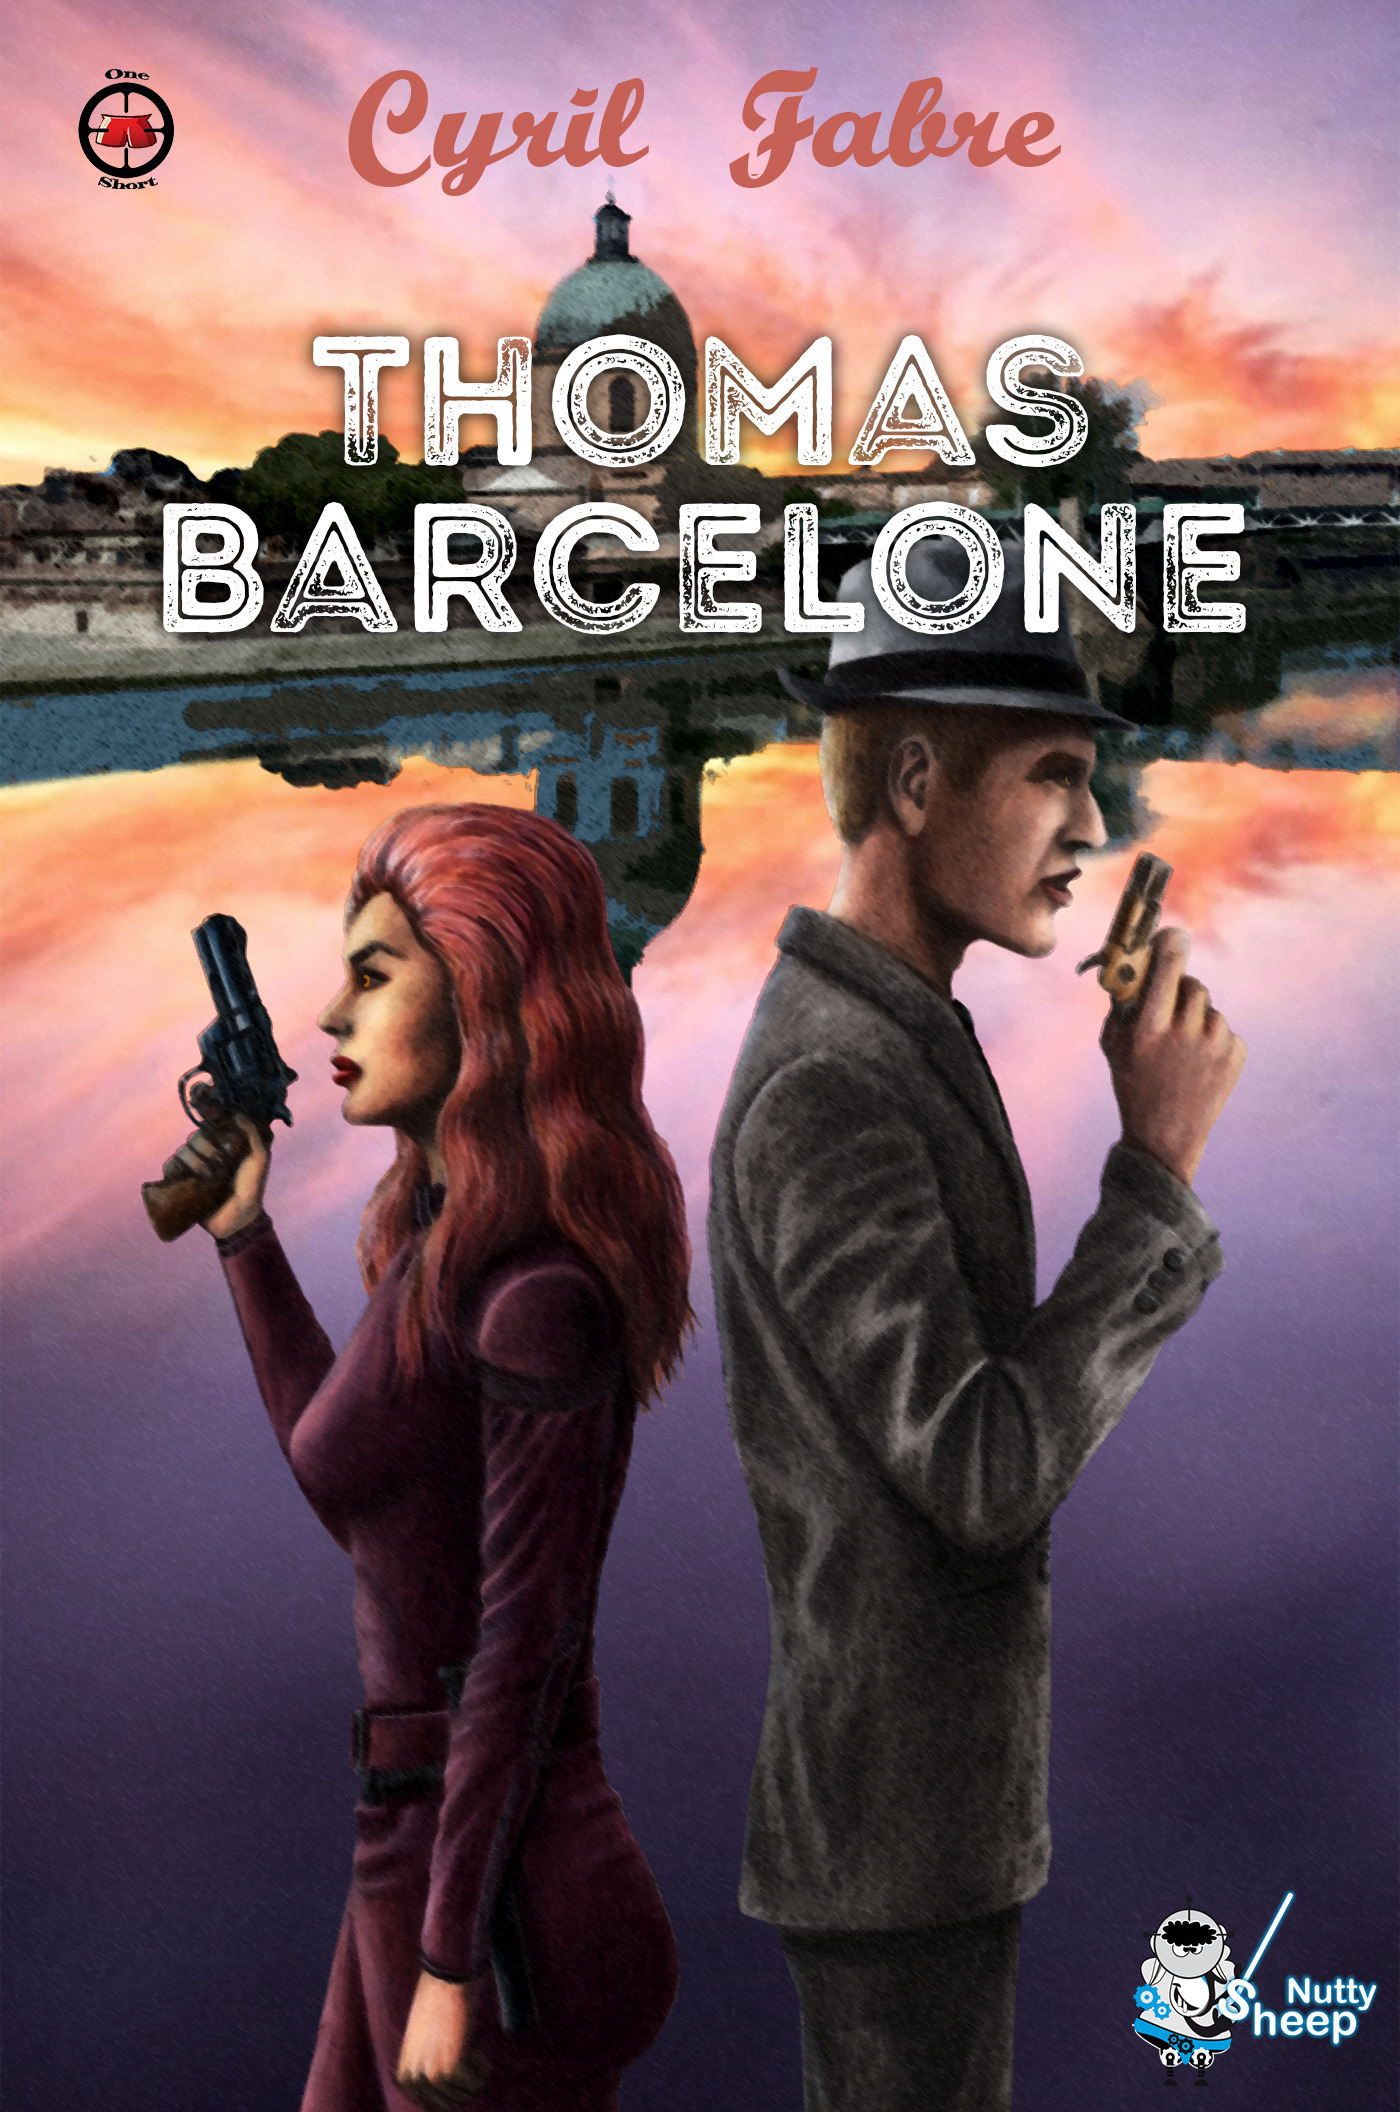 Thomas Barcelone